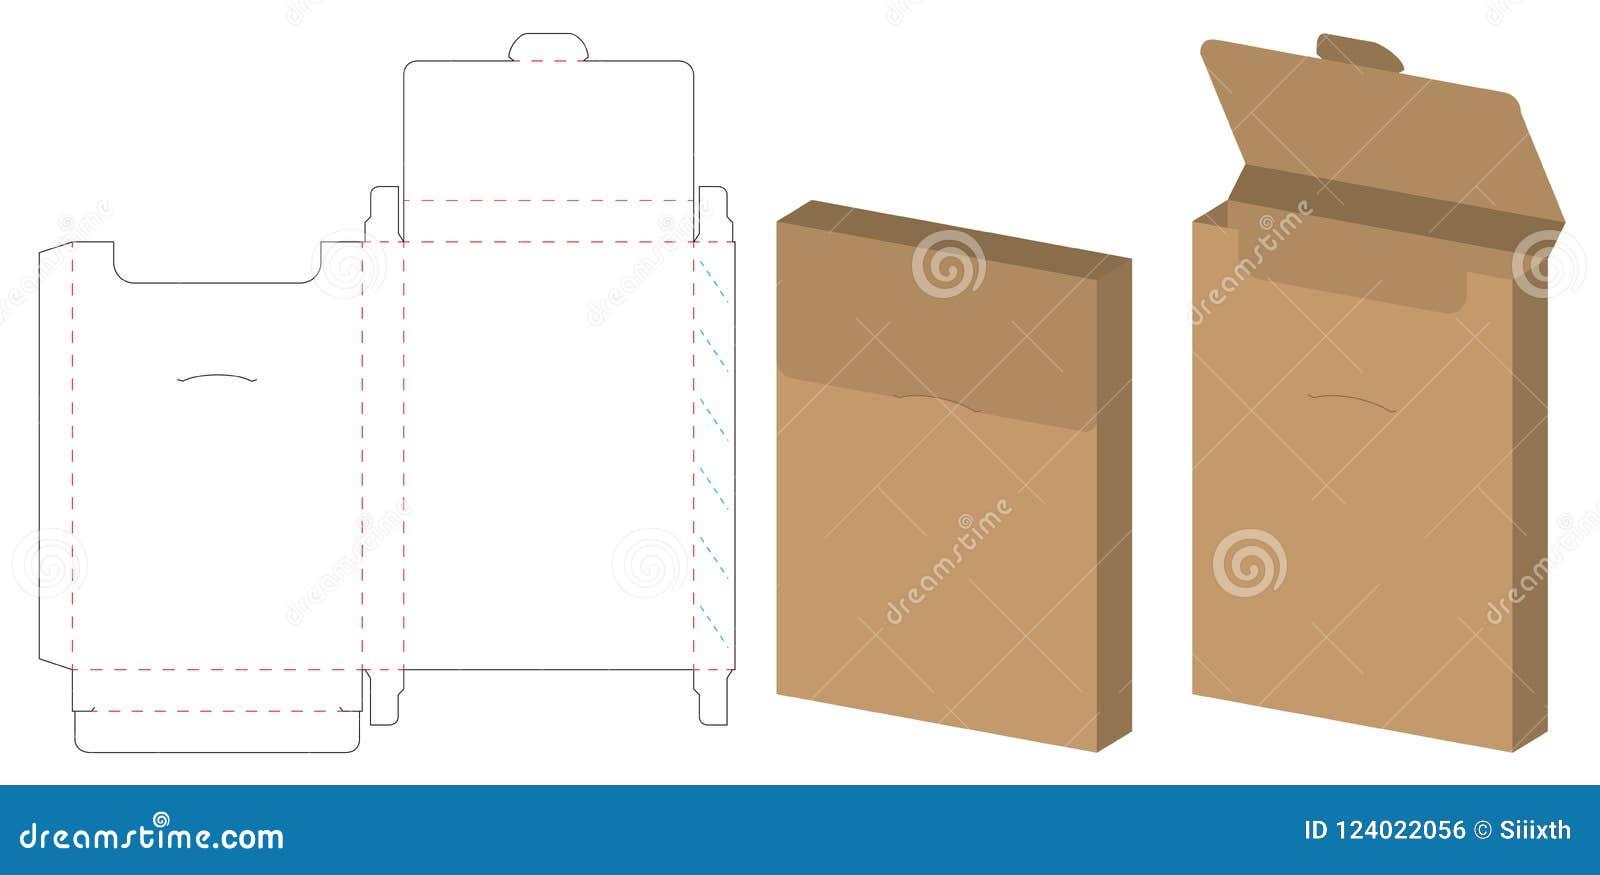 Box packaging die cut template design 3d mock up stock vector download box packaging die cut template design 3d mock up stock vector illustration malvernweather Choice Image